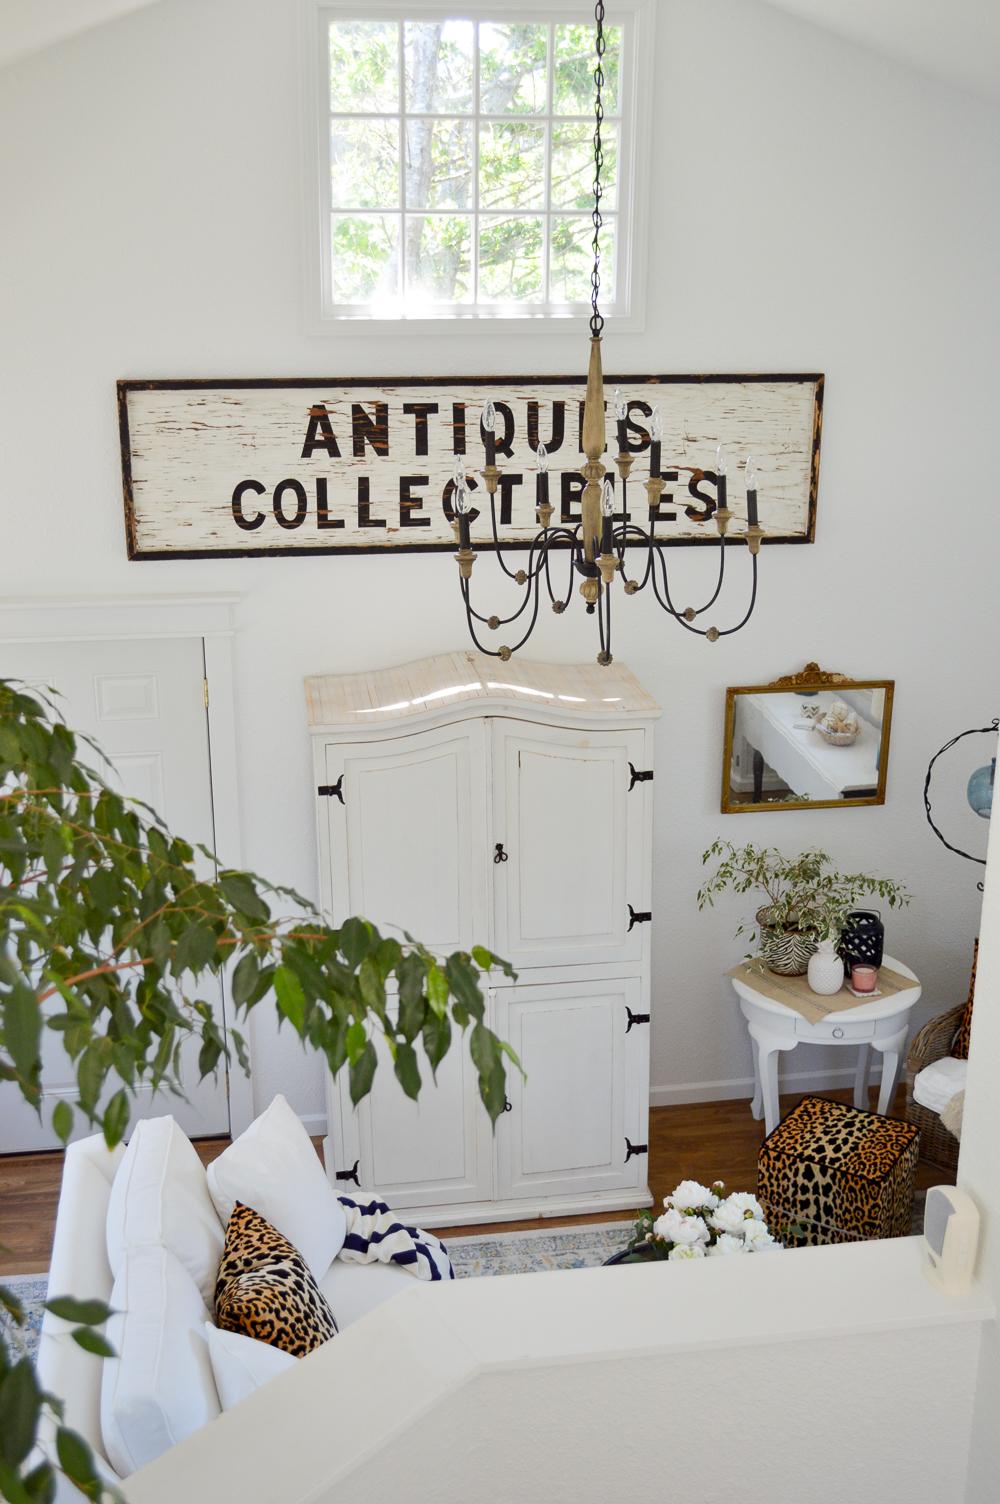 Guest Cottage Living Room Makeover Reveal, Chandelier from Home Depot   Living Room Makeover Reveal (at The Little Cottage)